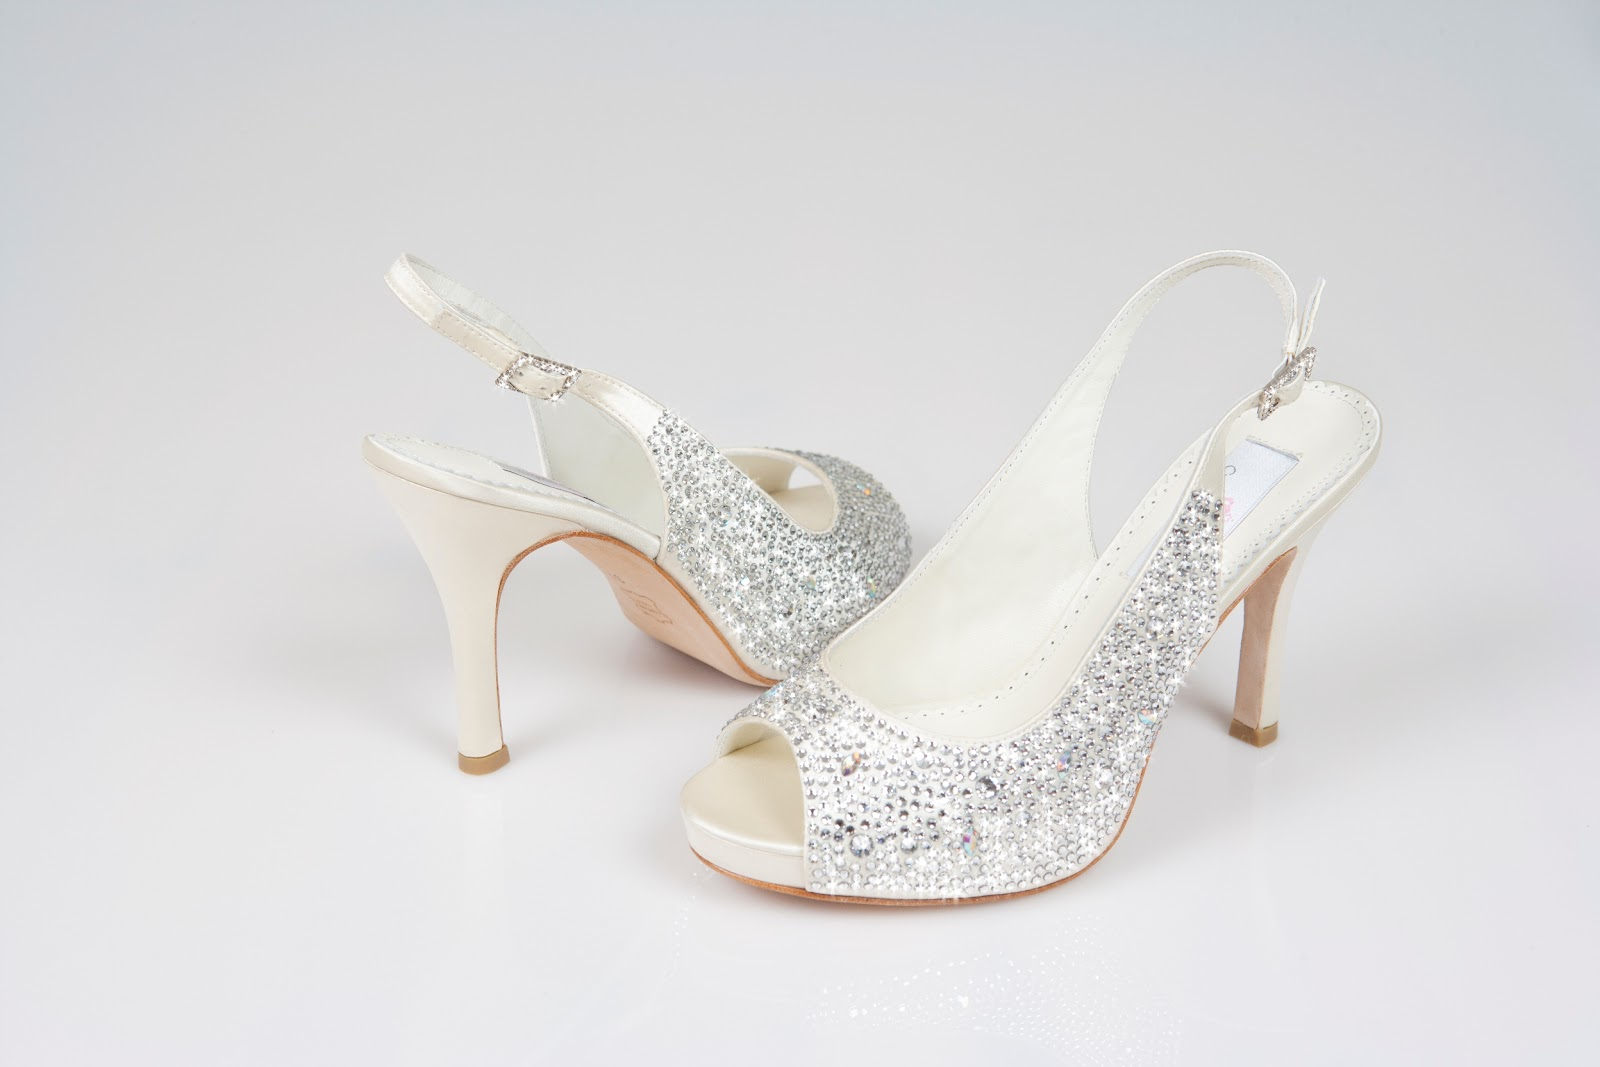 Swarovski Crystals Weding Shoes 013 - Swarovski Crystals Weding Shoes